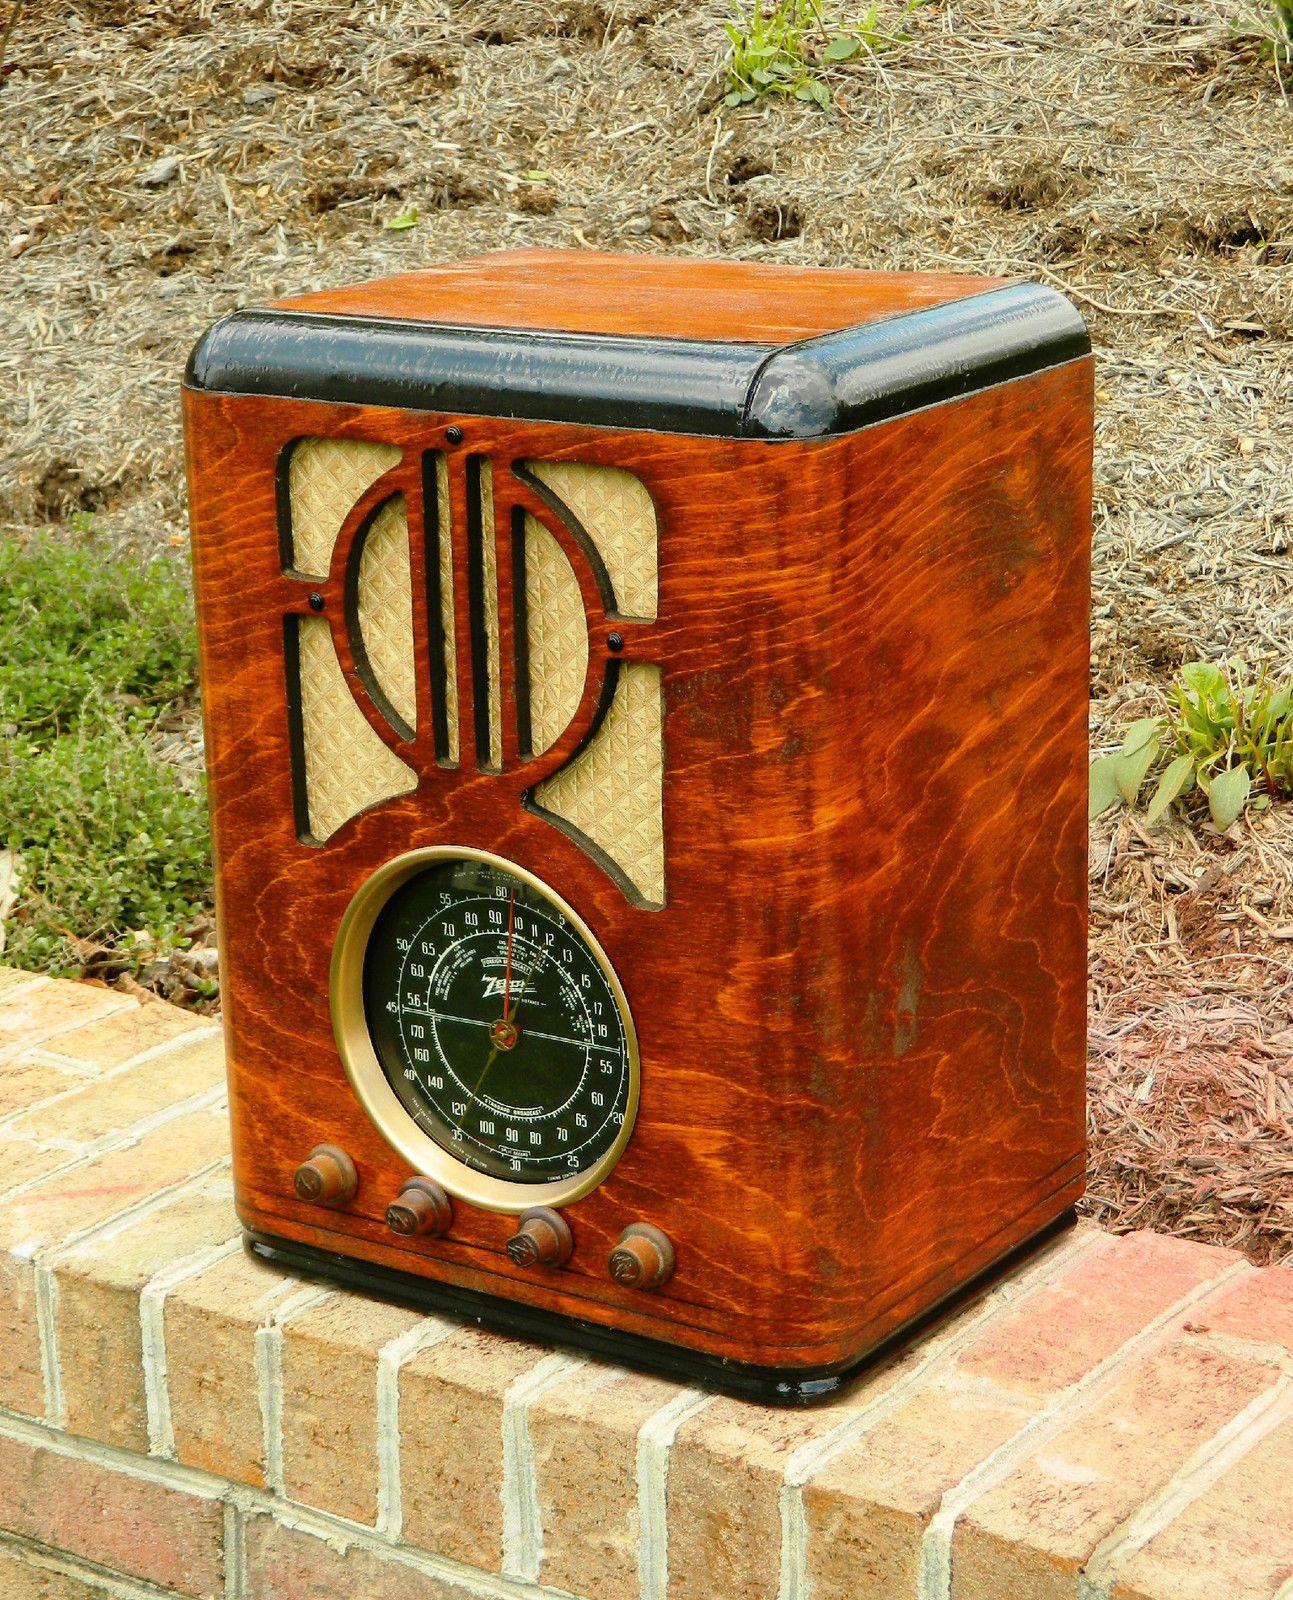 1938 Zenith Am And Shortwave Radio Model 6j230 Restored Cabinet